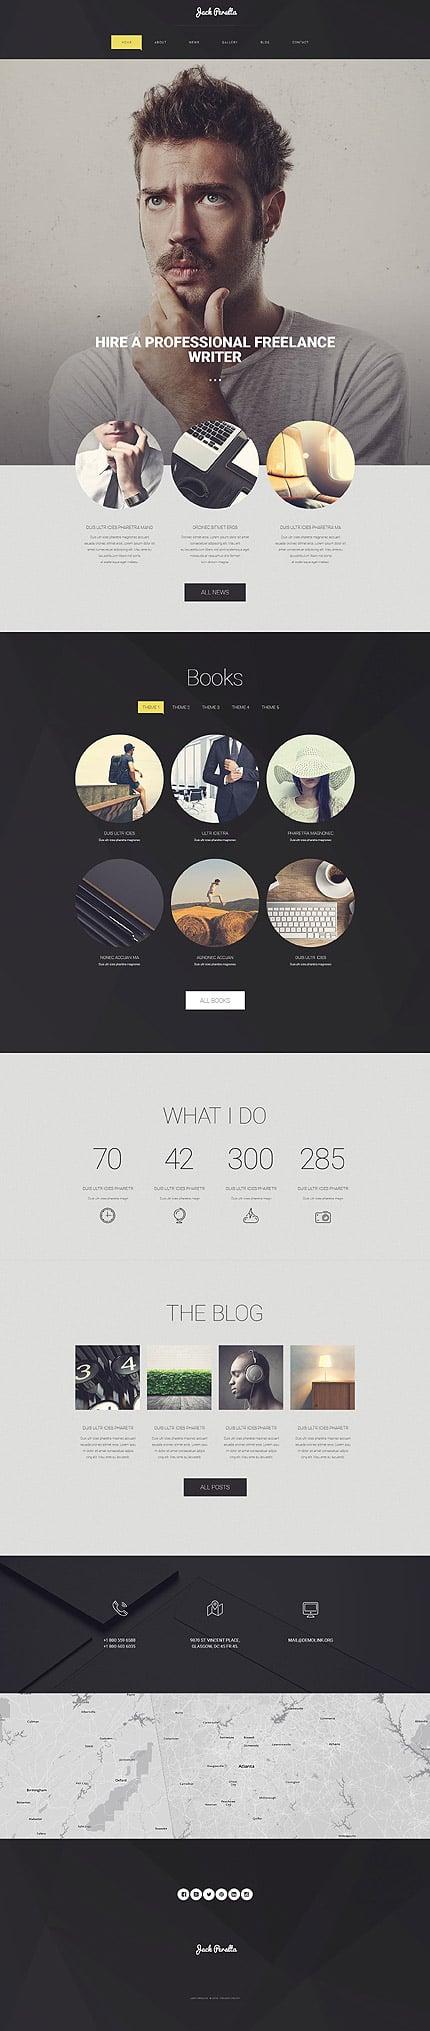 WordPress Theme/Template 54585 Main Page Screenshot